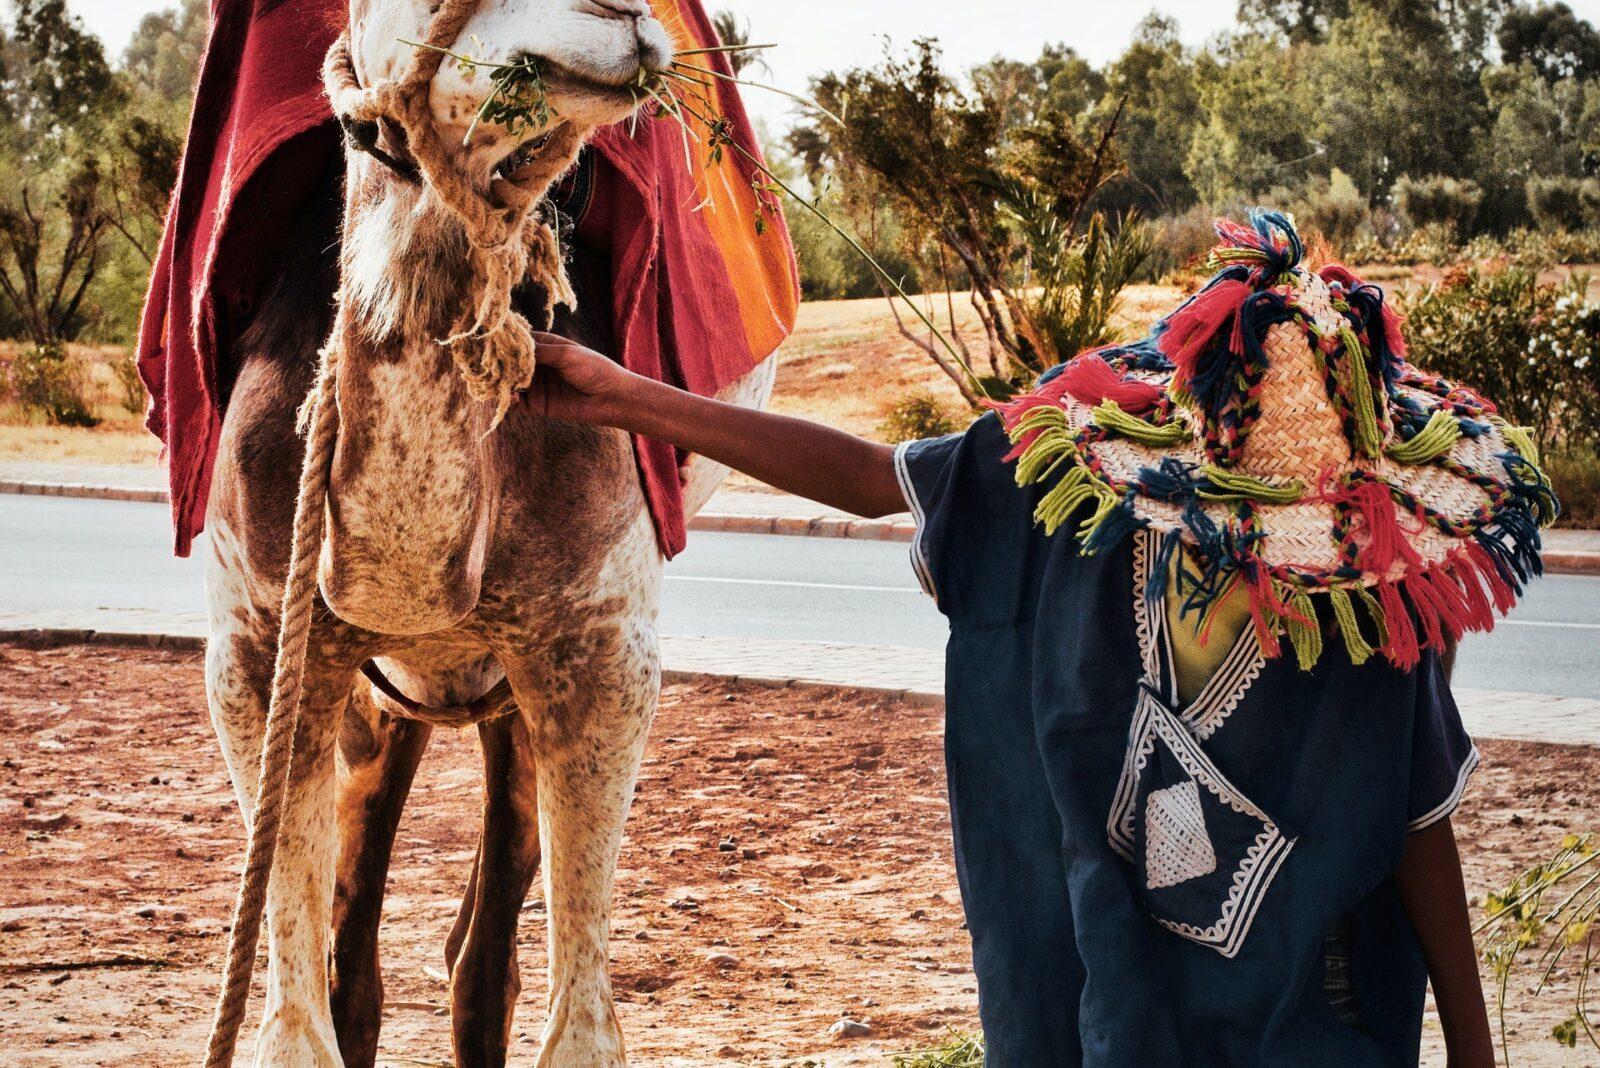 pexels adam b 3123690 - Morocco camel trekking tours | Morocco Desert Camp | Camel Trekking In Merzouga